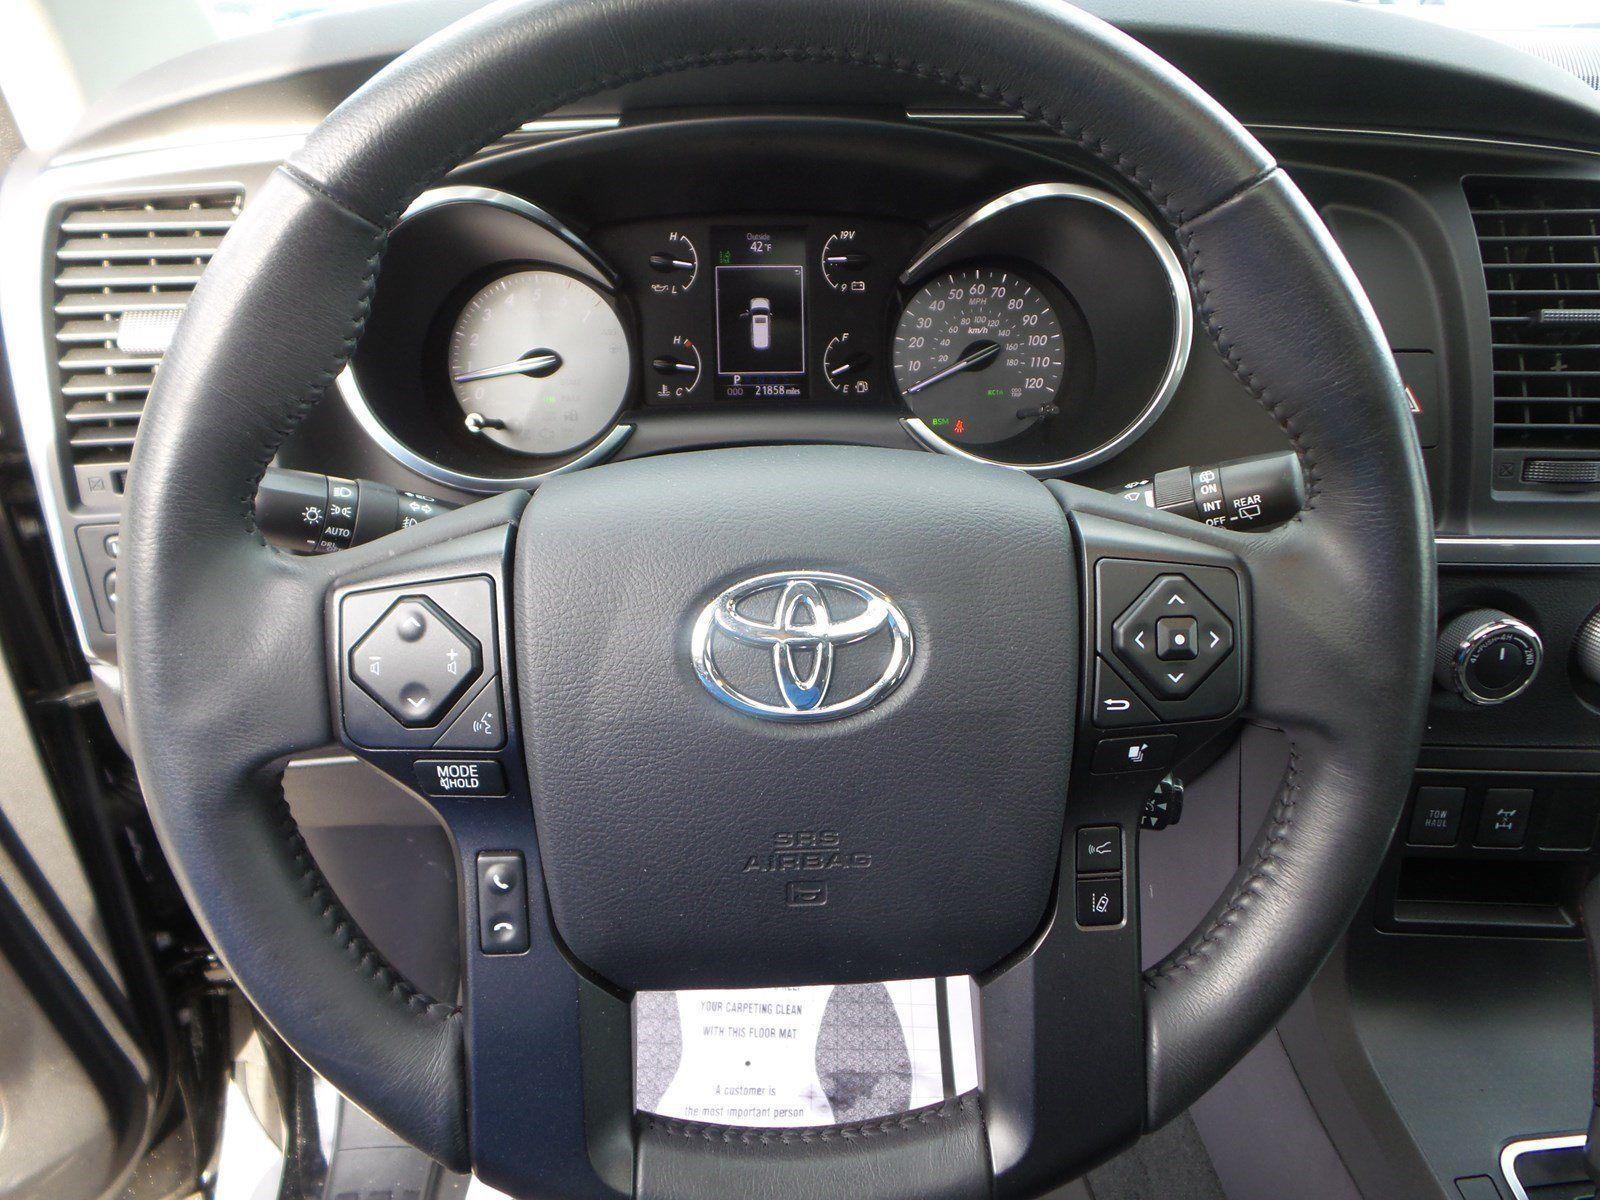 2021 Toyota Verso Exterior and Interior